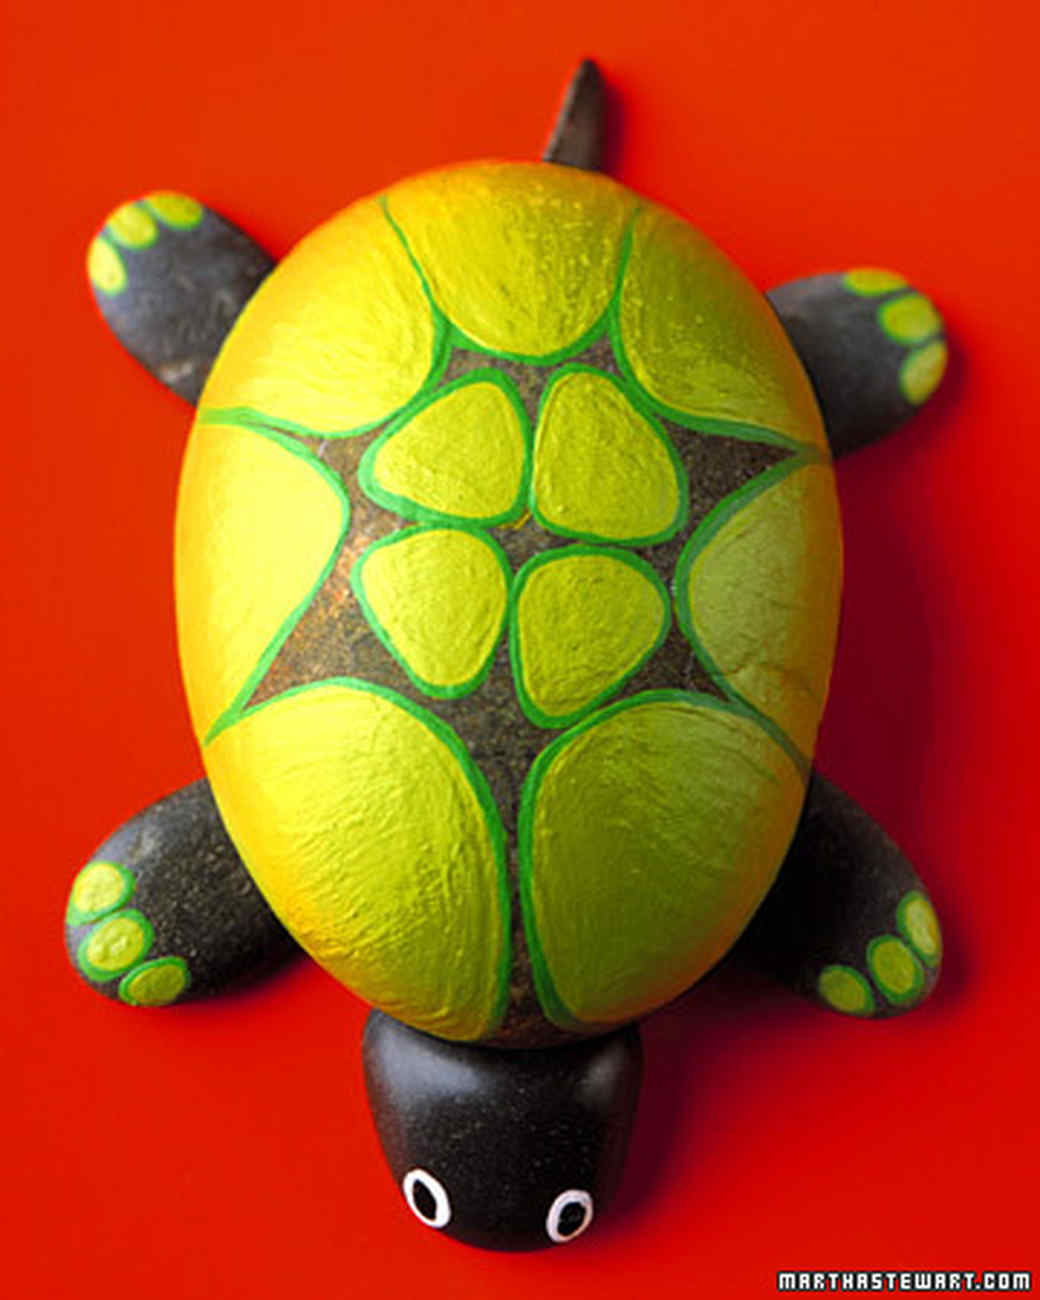 a99348_win06_turtlegrid.jpg